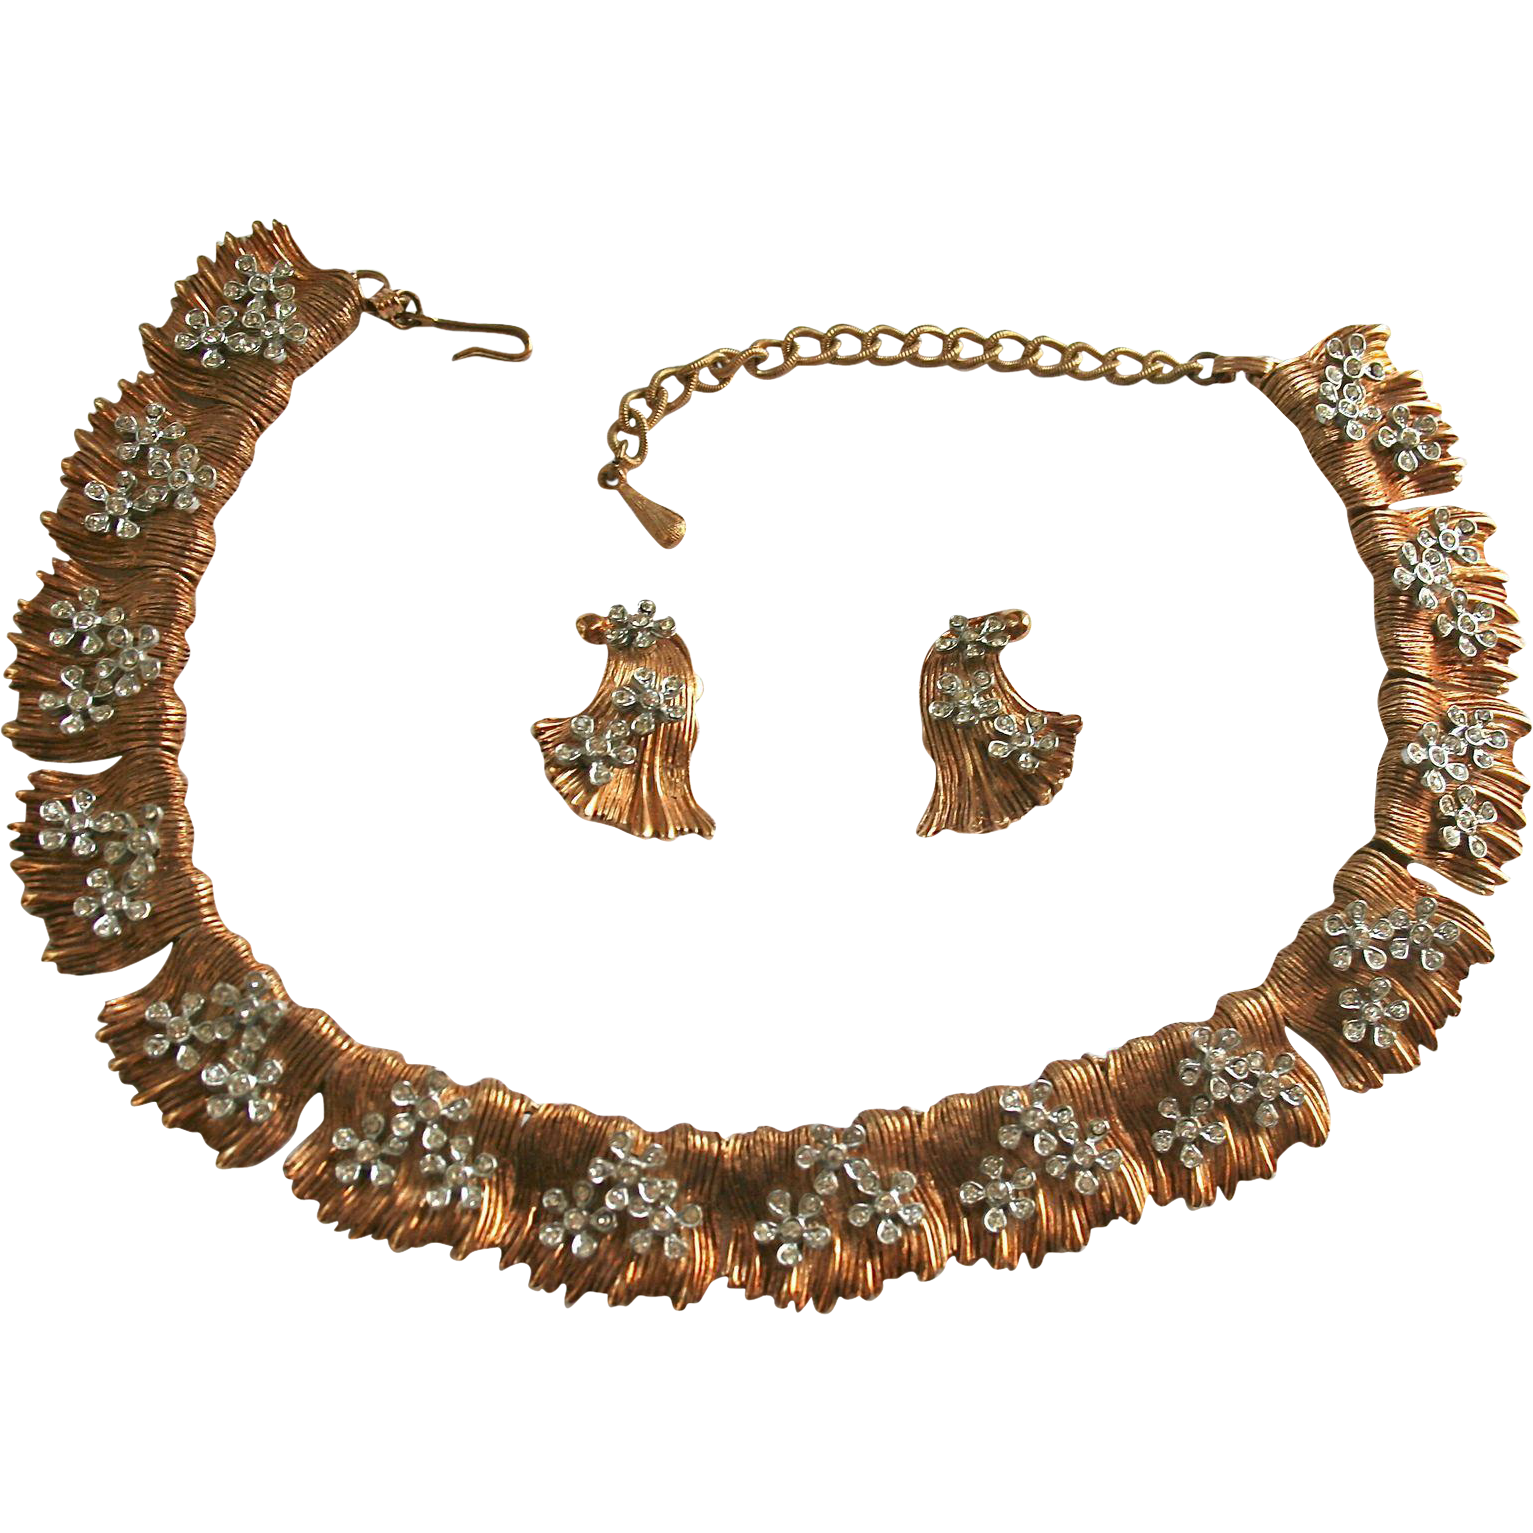 Rare 3-D Raised Rhinestone Gold-Plated Draping Metal Bib Necklace Set